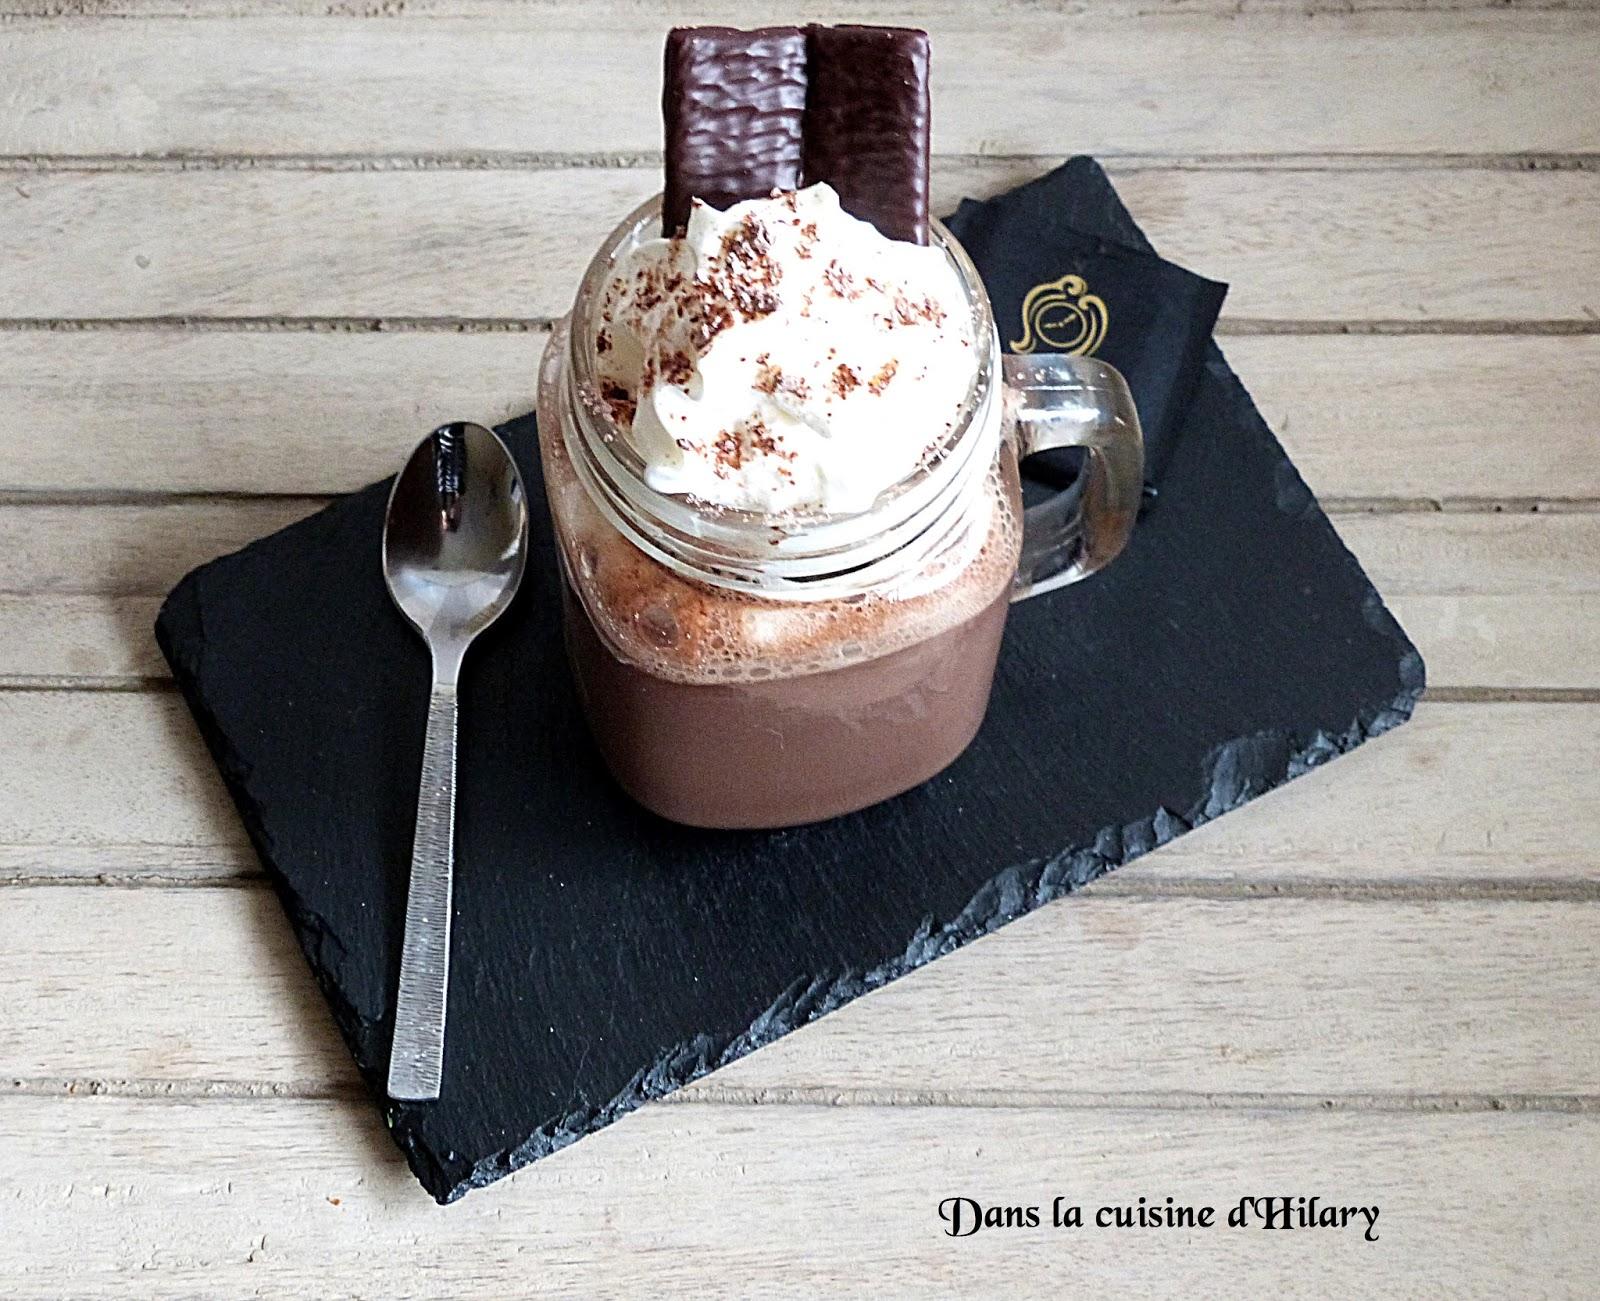 dans la cuisine d 39 hilary chocolat chaud gourmand la menthe fa on after eight yummy mint. Black Bedroom Furniture Sets. Home Design Ideas